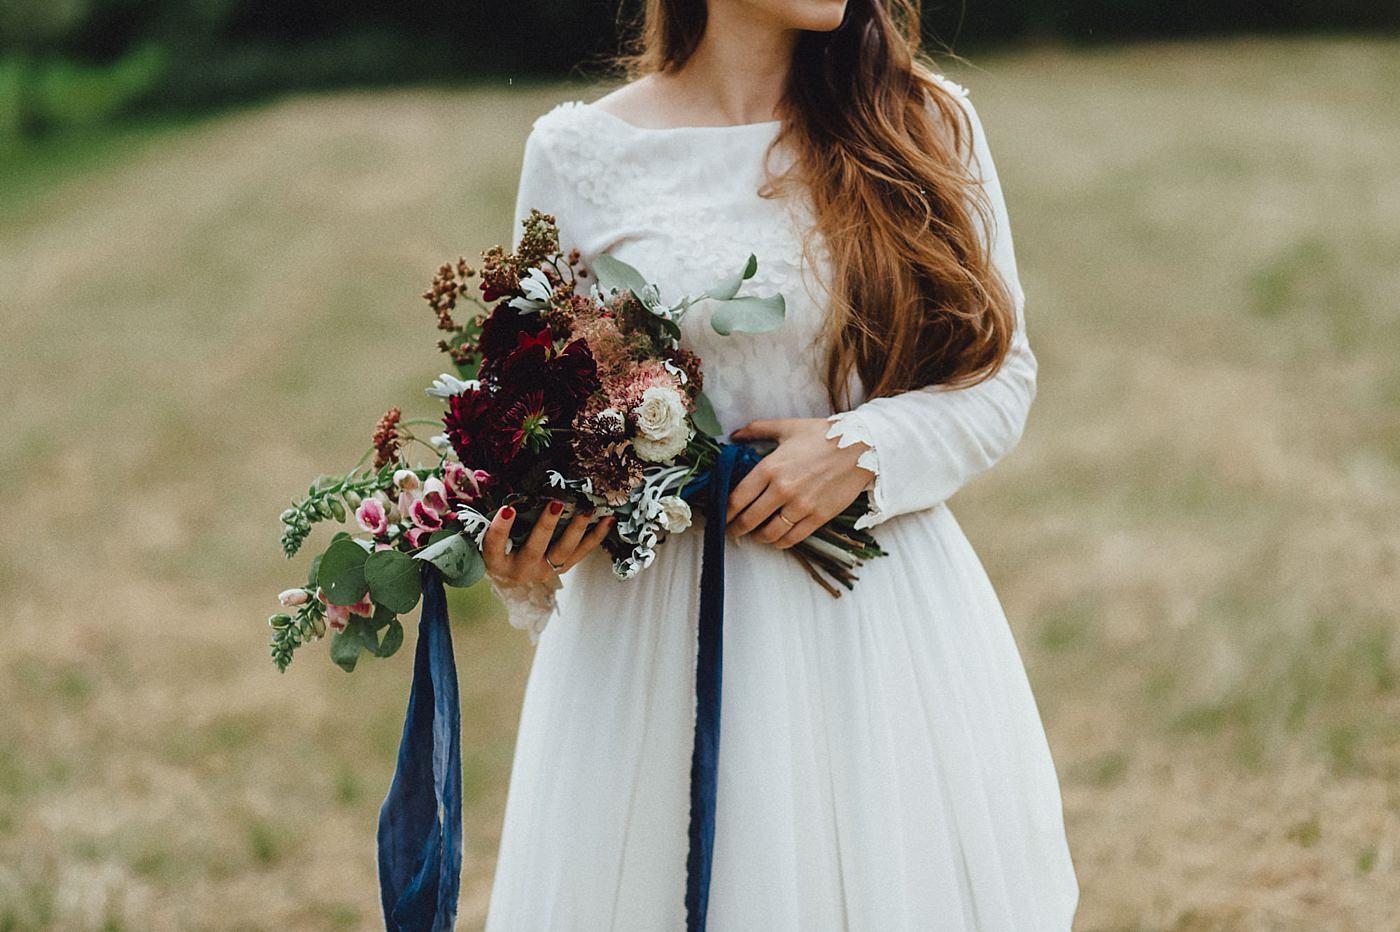 urban-elopement-wedding-244